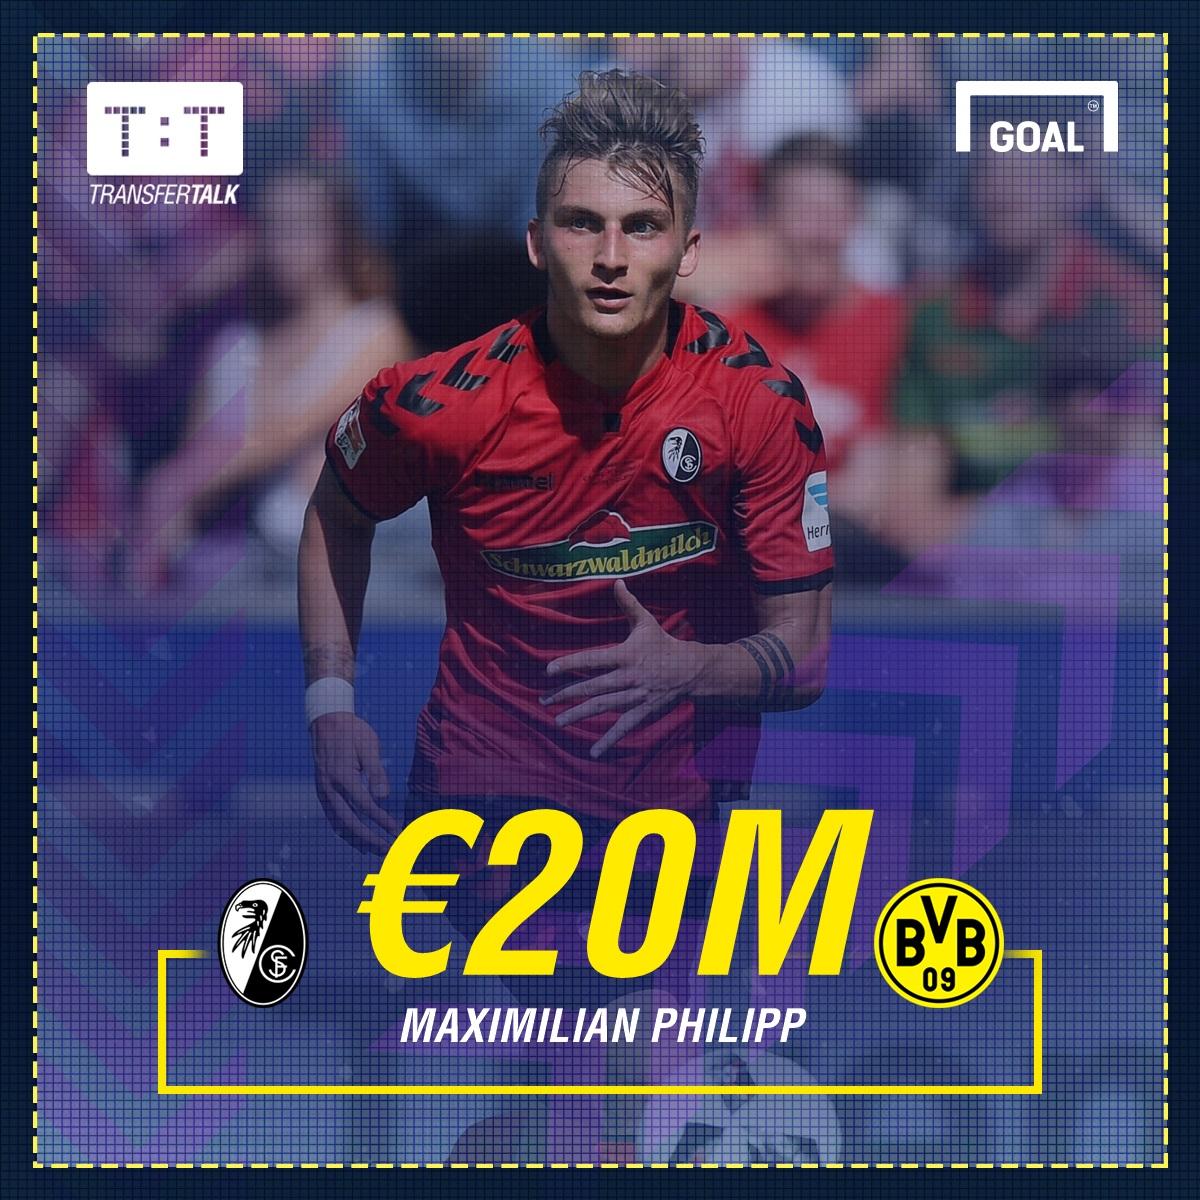 Bvb Dortmund Transfer